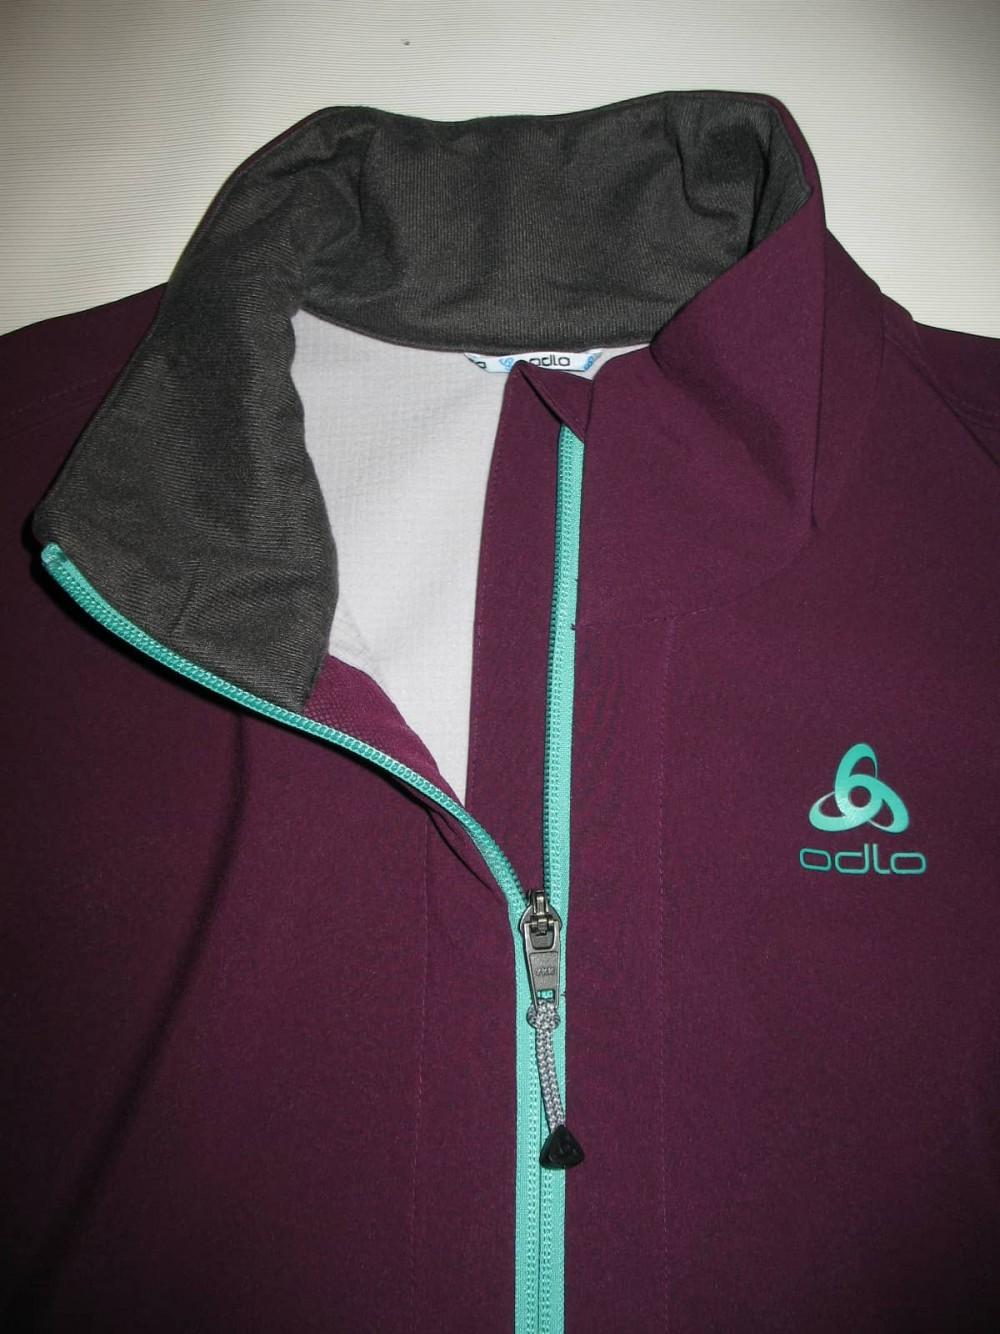 Куртка ODLO logic windproof softshell jacket lady (размер XXL) - 1